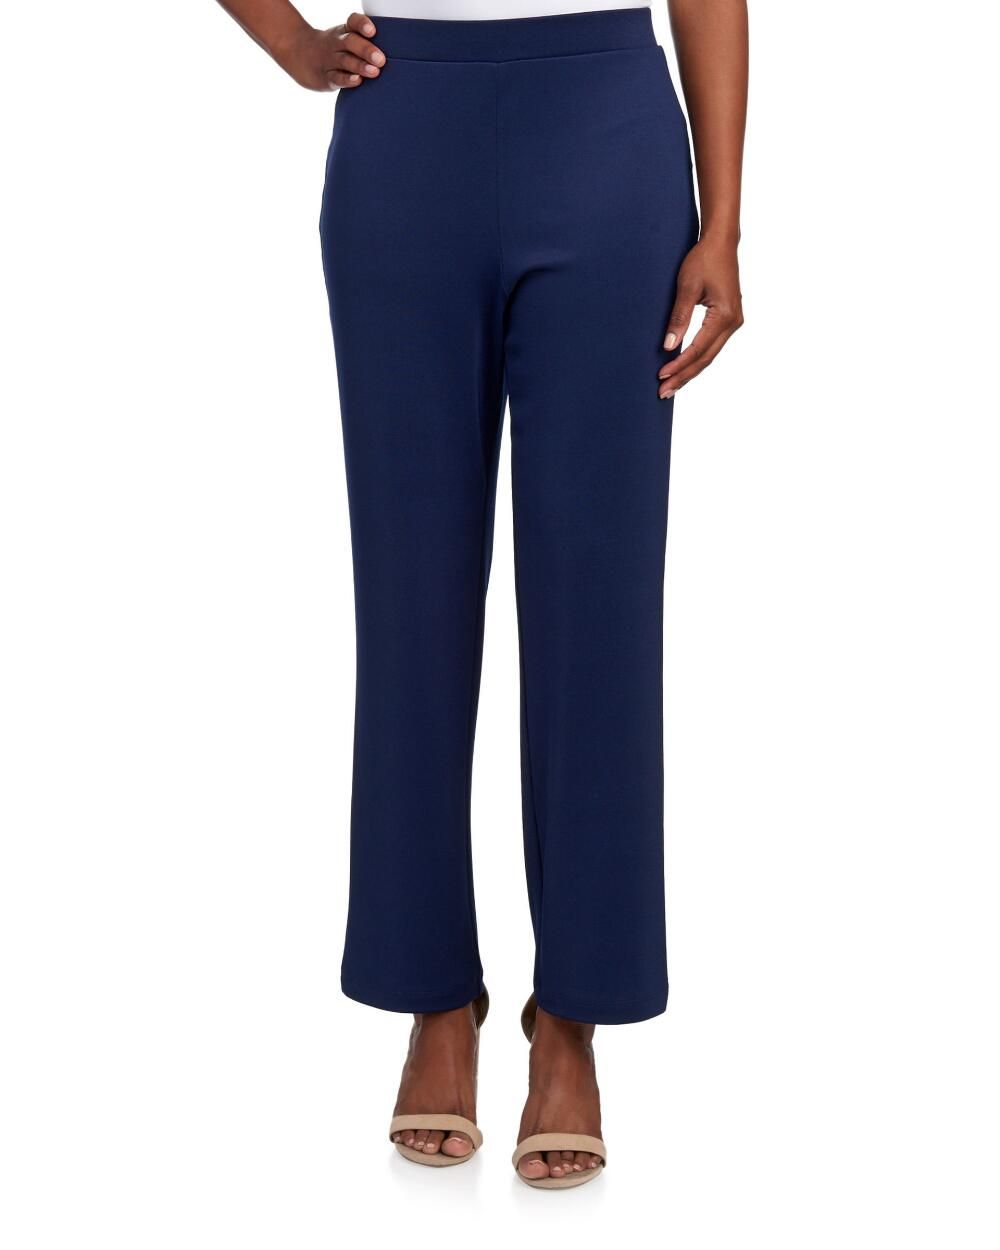 Petite Solid Jersey Knit Pants Pants Leggings Petites Women Stein Mart Knit Jersey Knit Pants Pants [ 1250 x 1000 Pixel ]